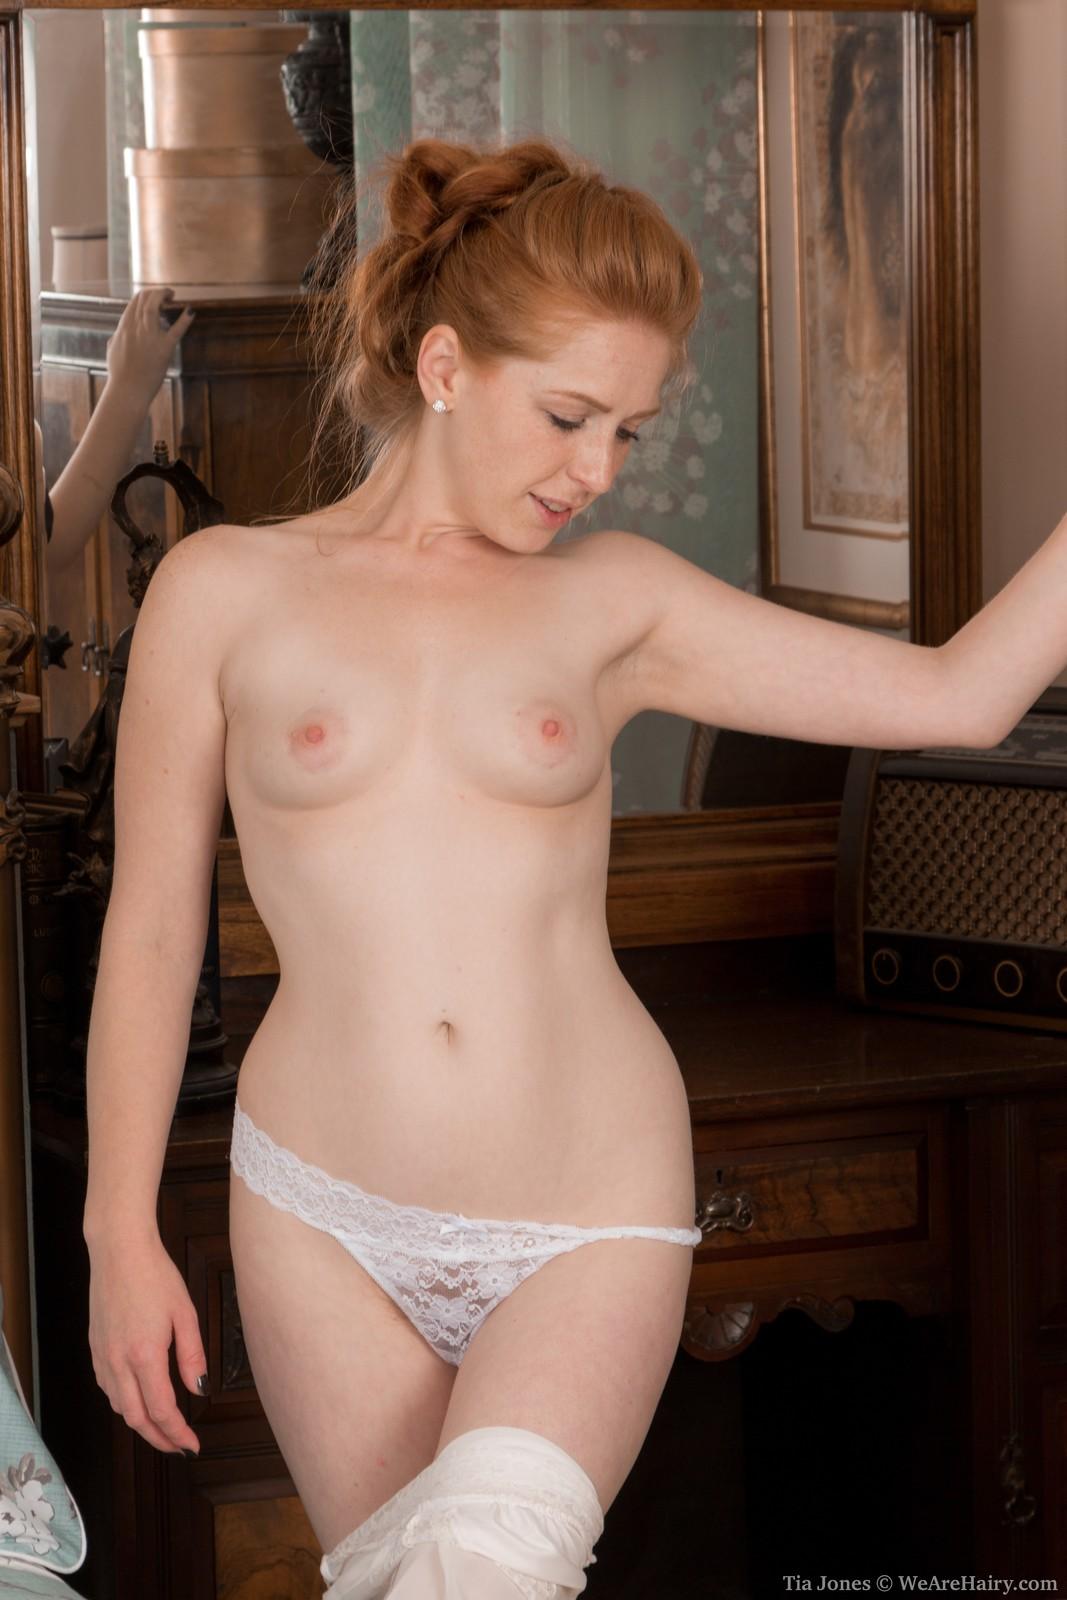 cartwright-freeporn-redhead-nude-hairy-amatuers-cock-blowjob